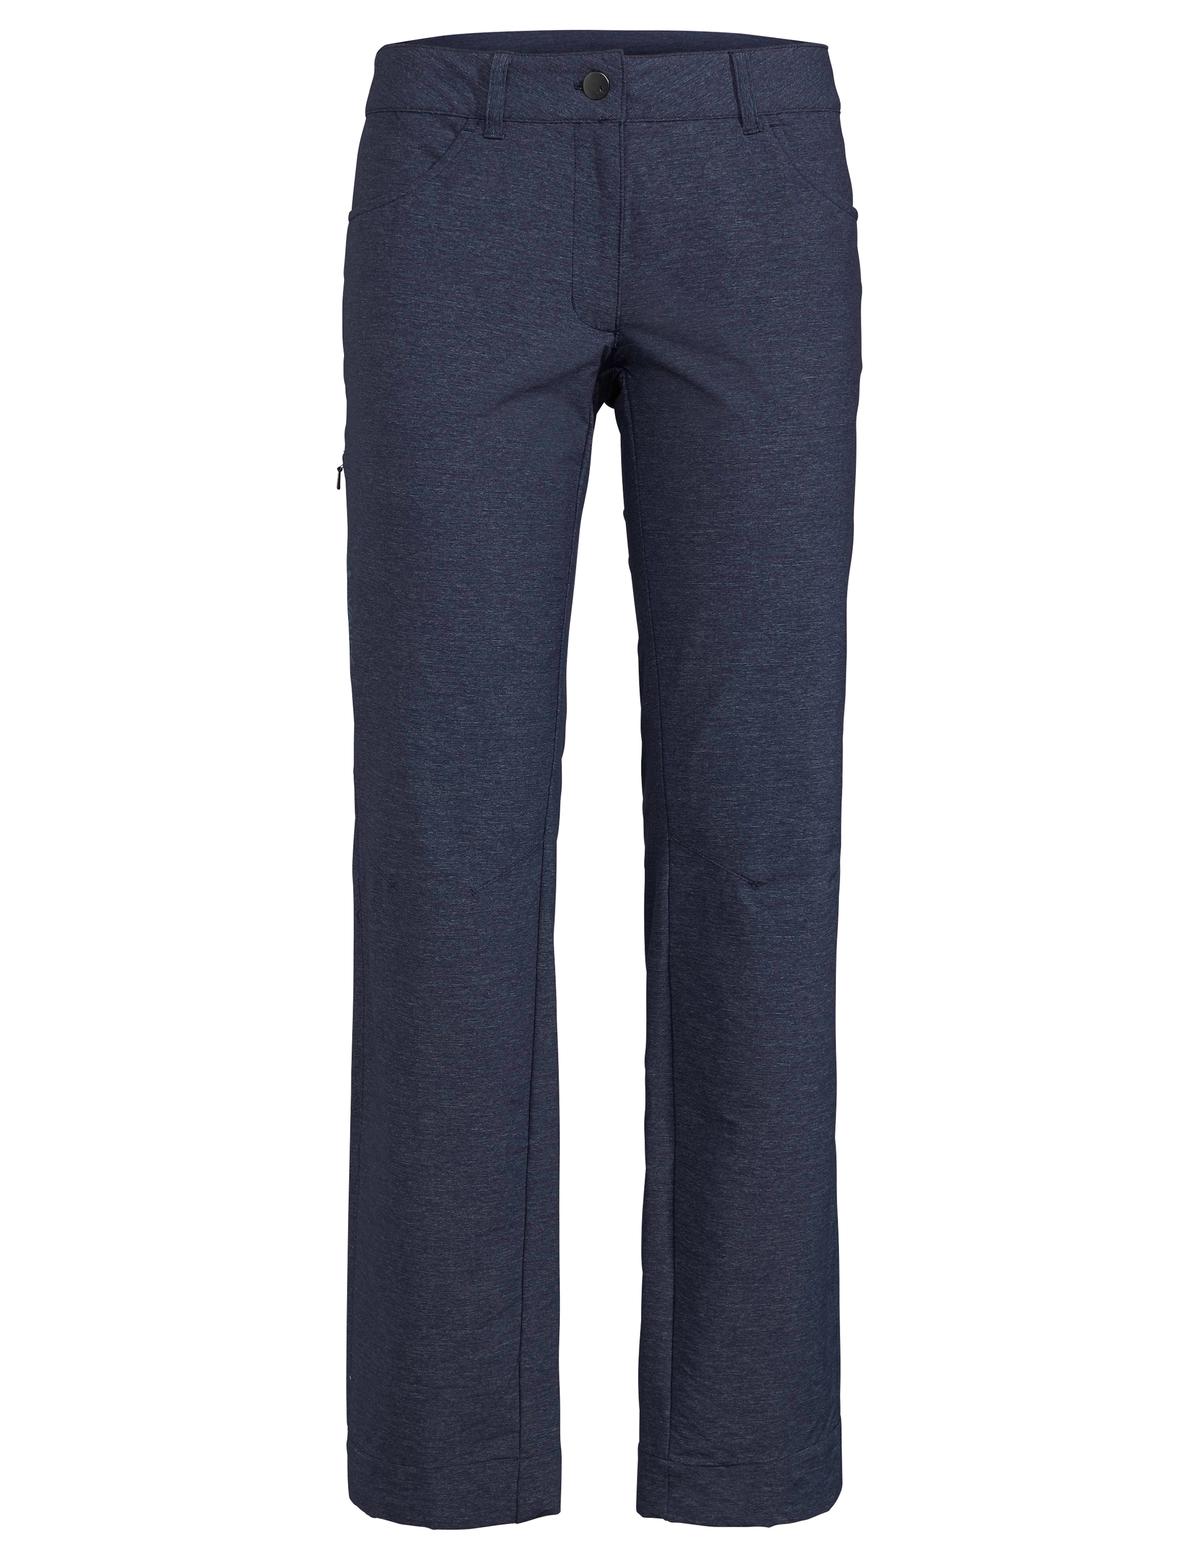 Vaude Womens Turifo Pants